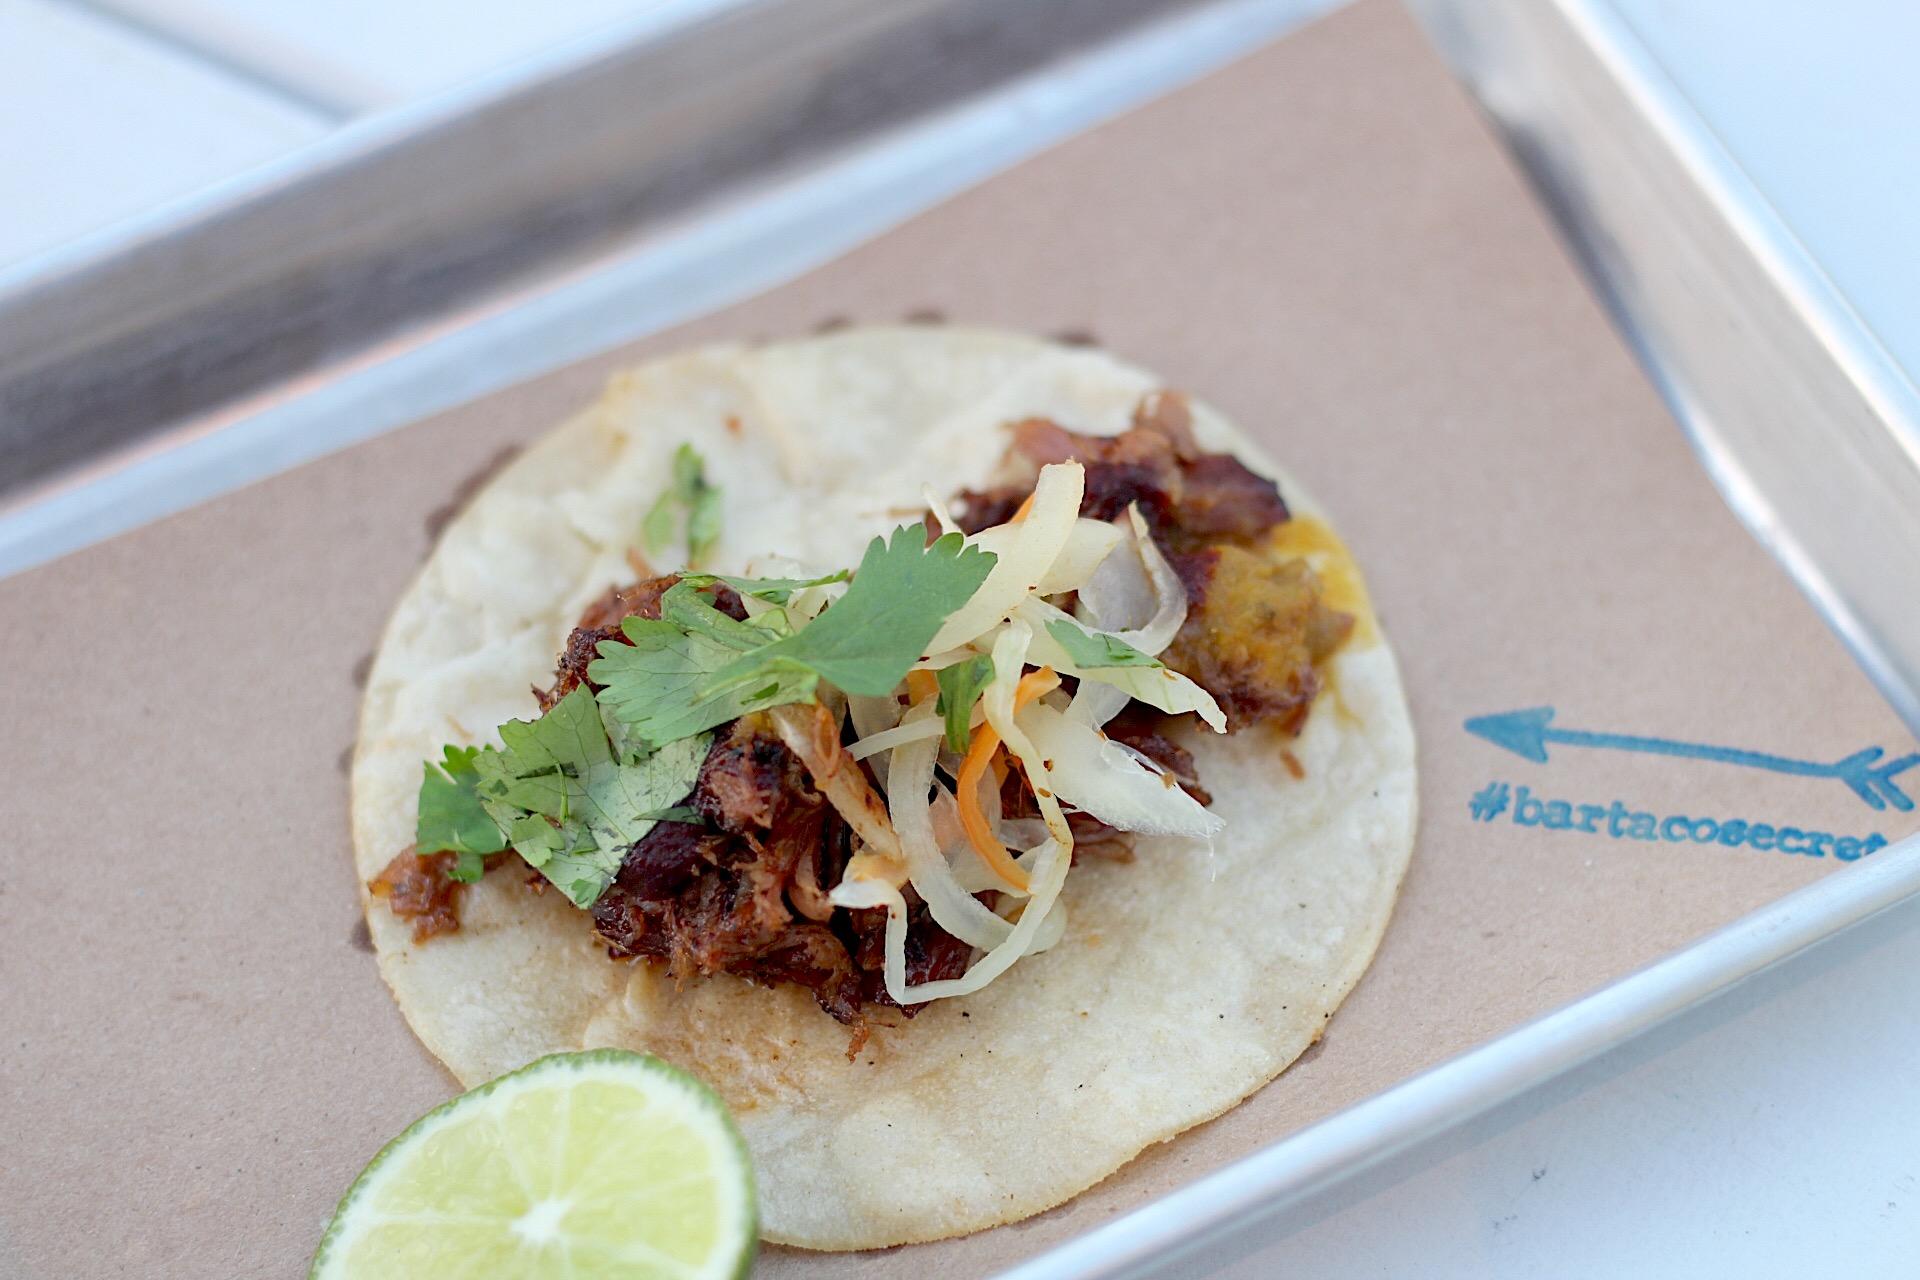 The new #bartacosecret taco. So good!